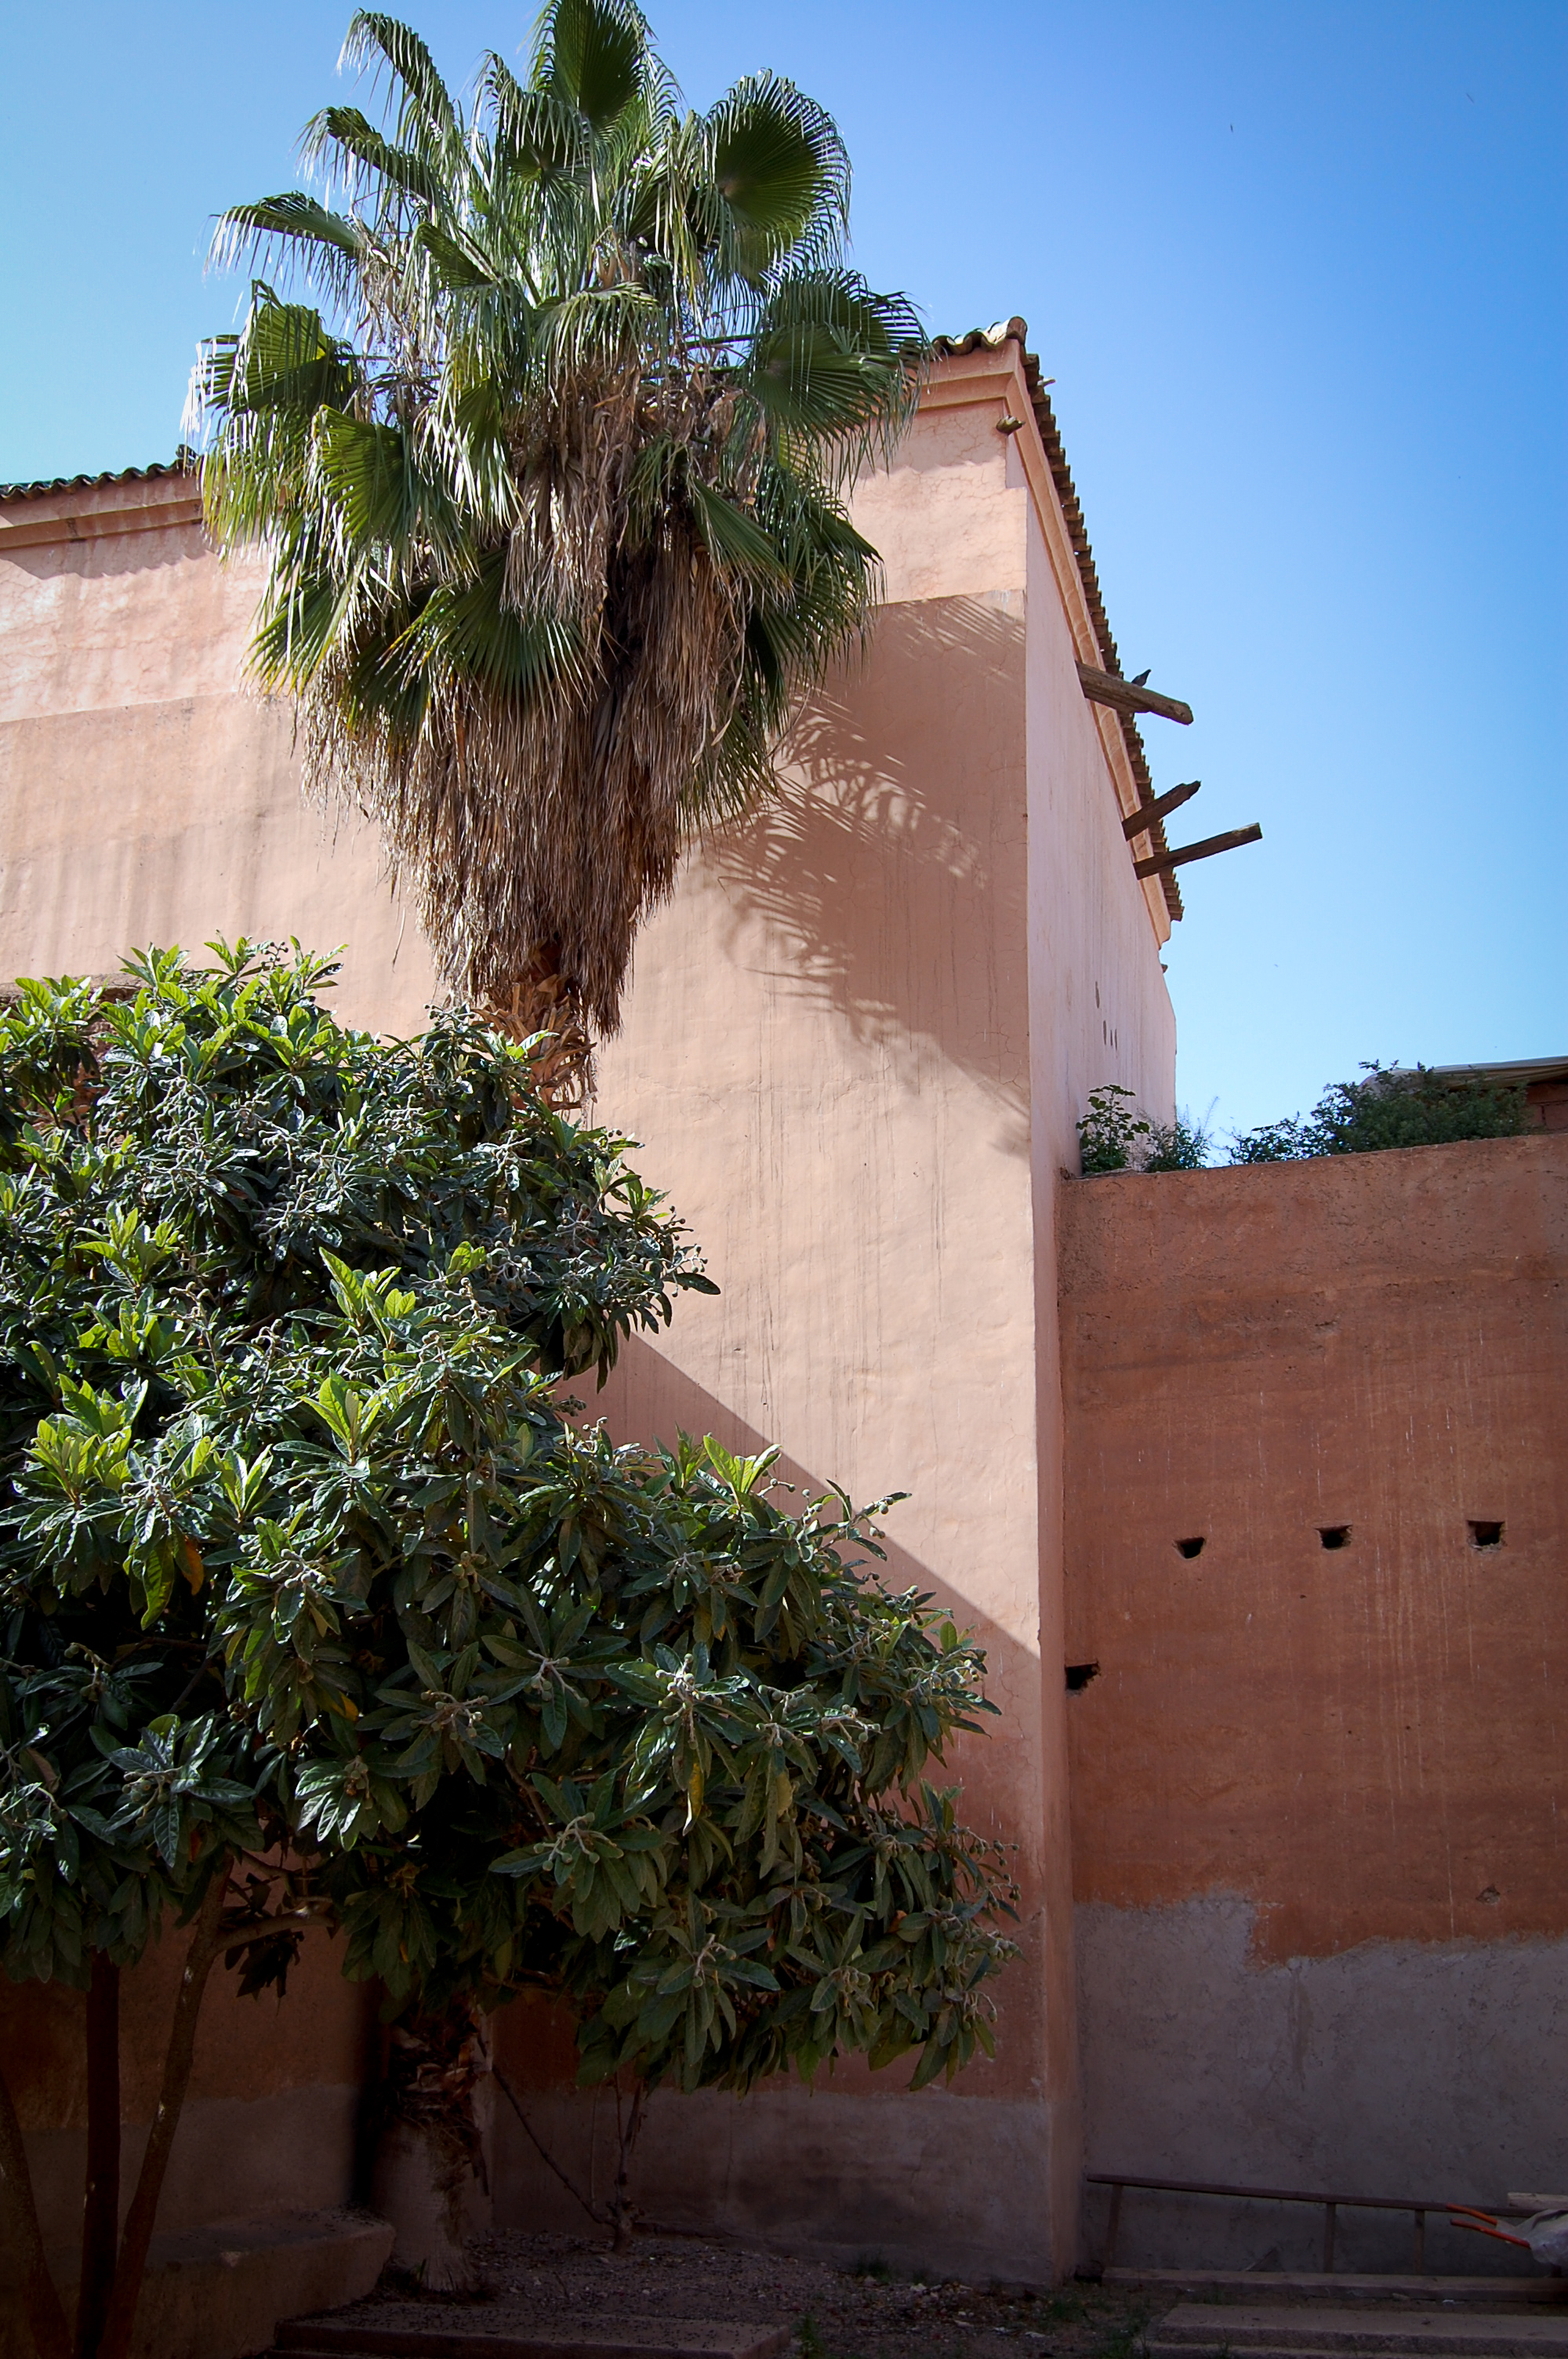 morocco (28 of 39).jpg